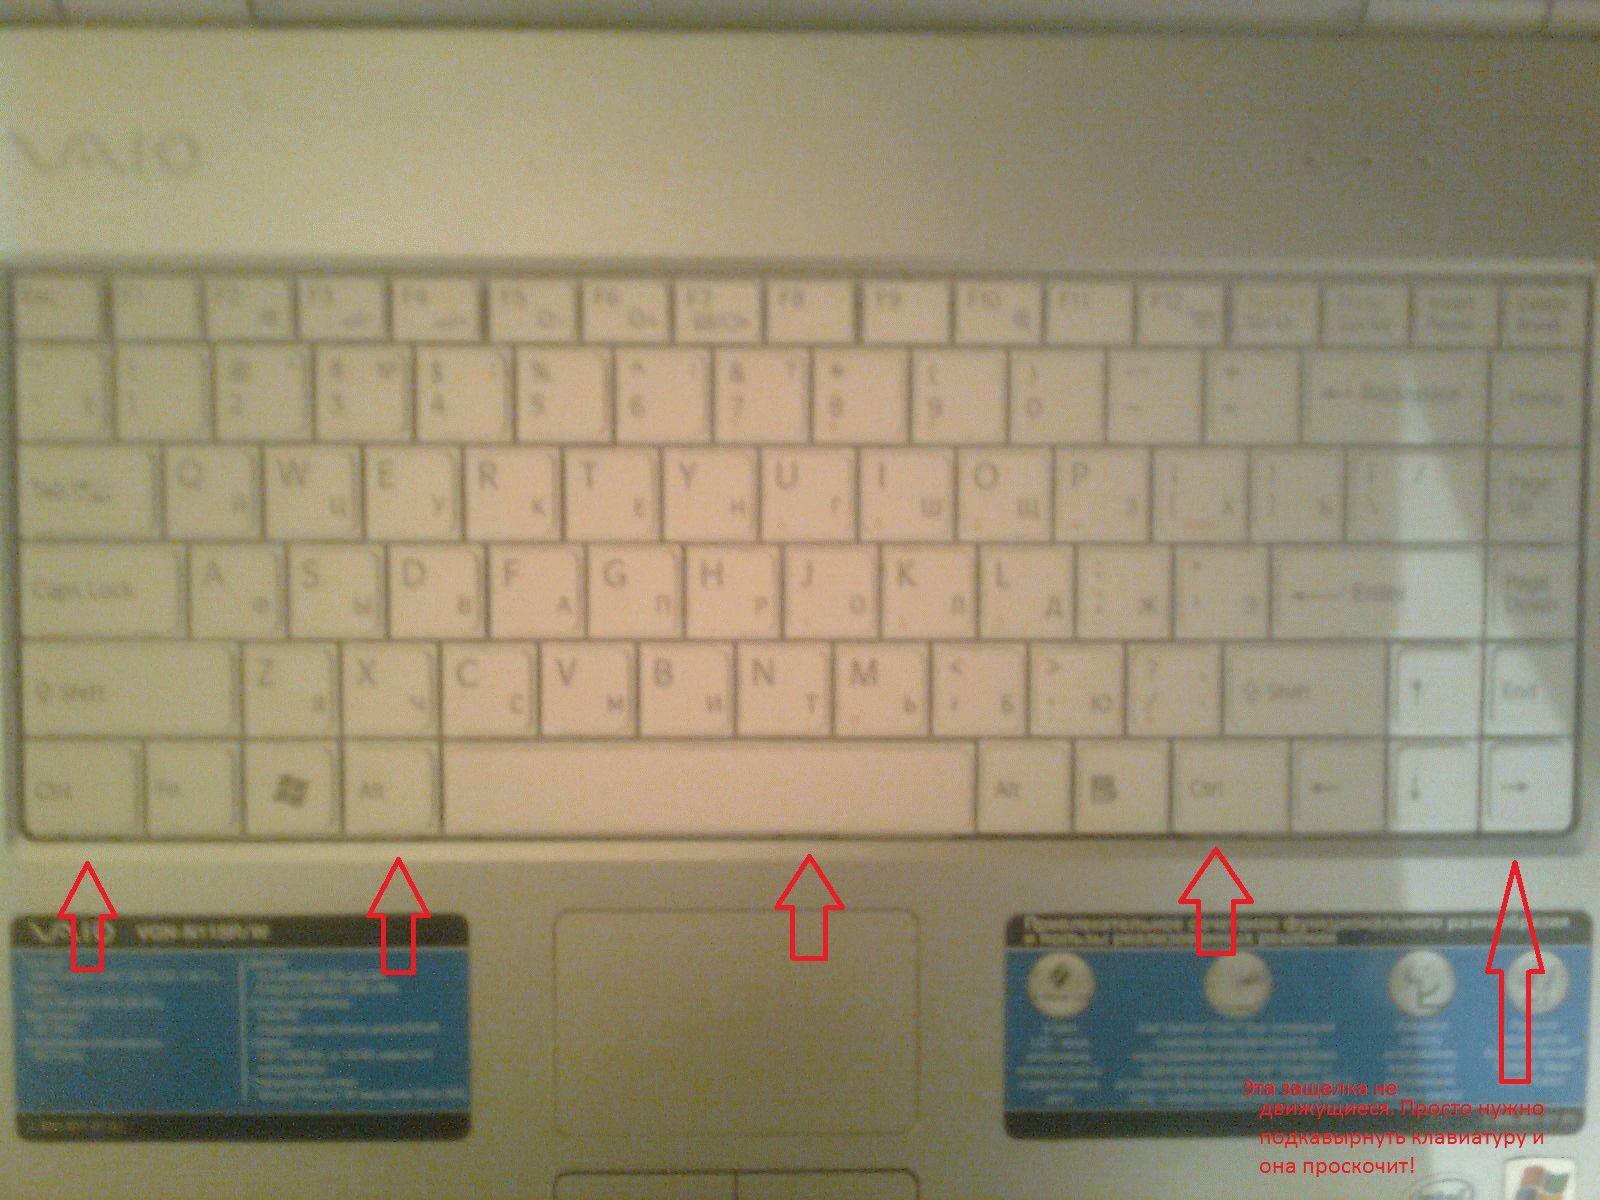 инструкция по разборке ноутбука sony vaio vgn